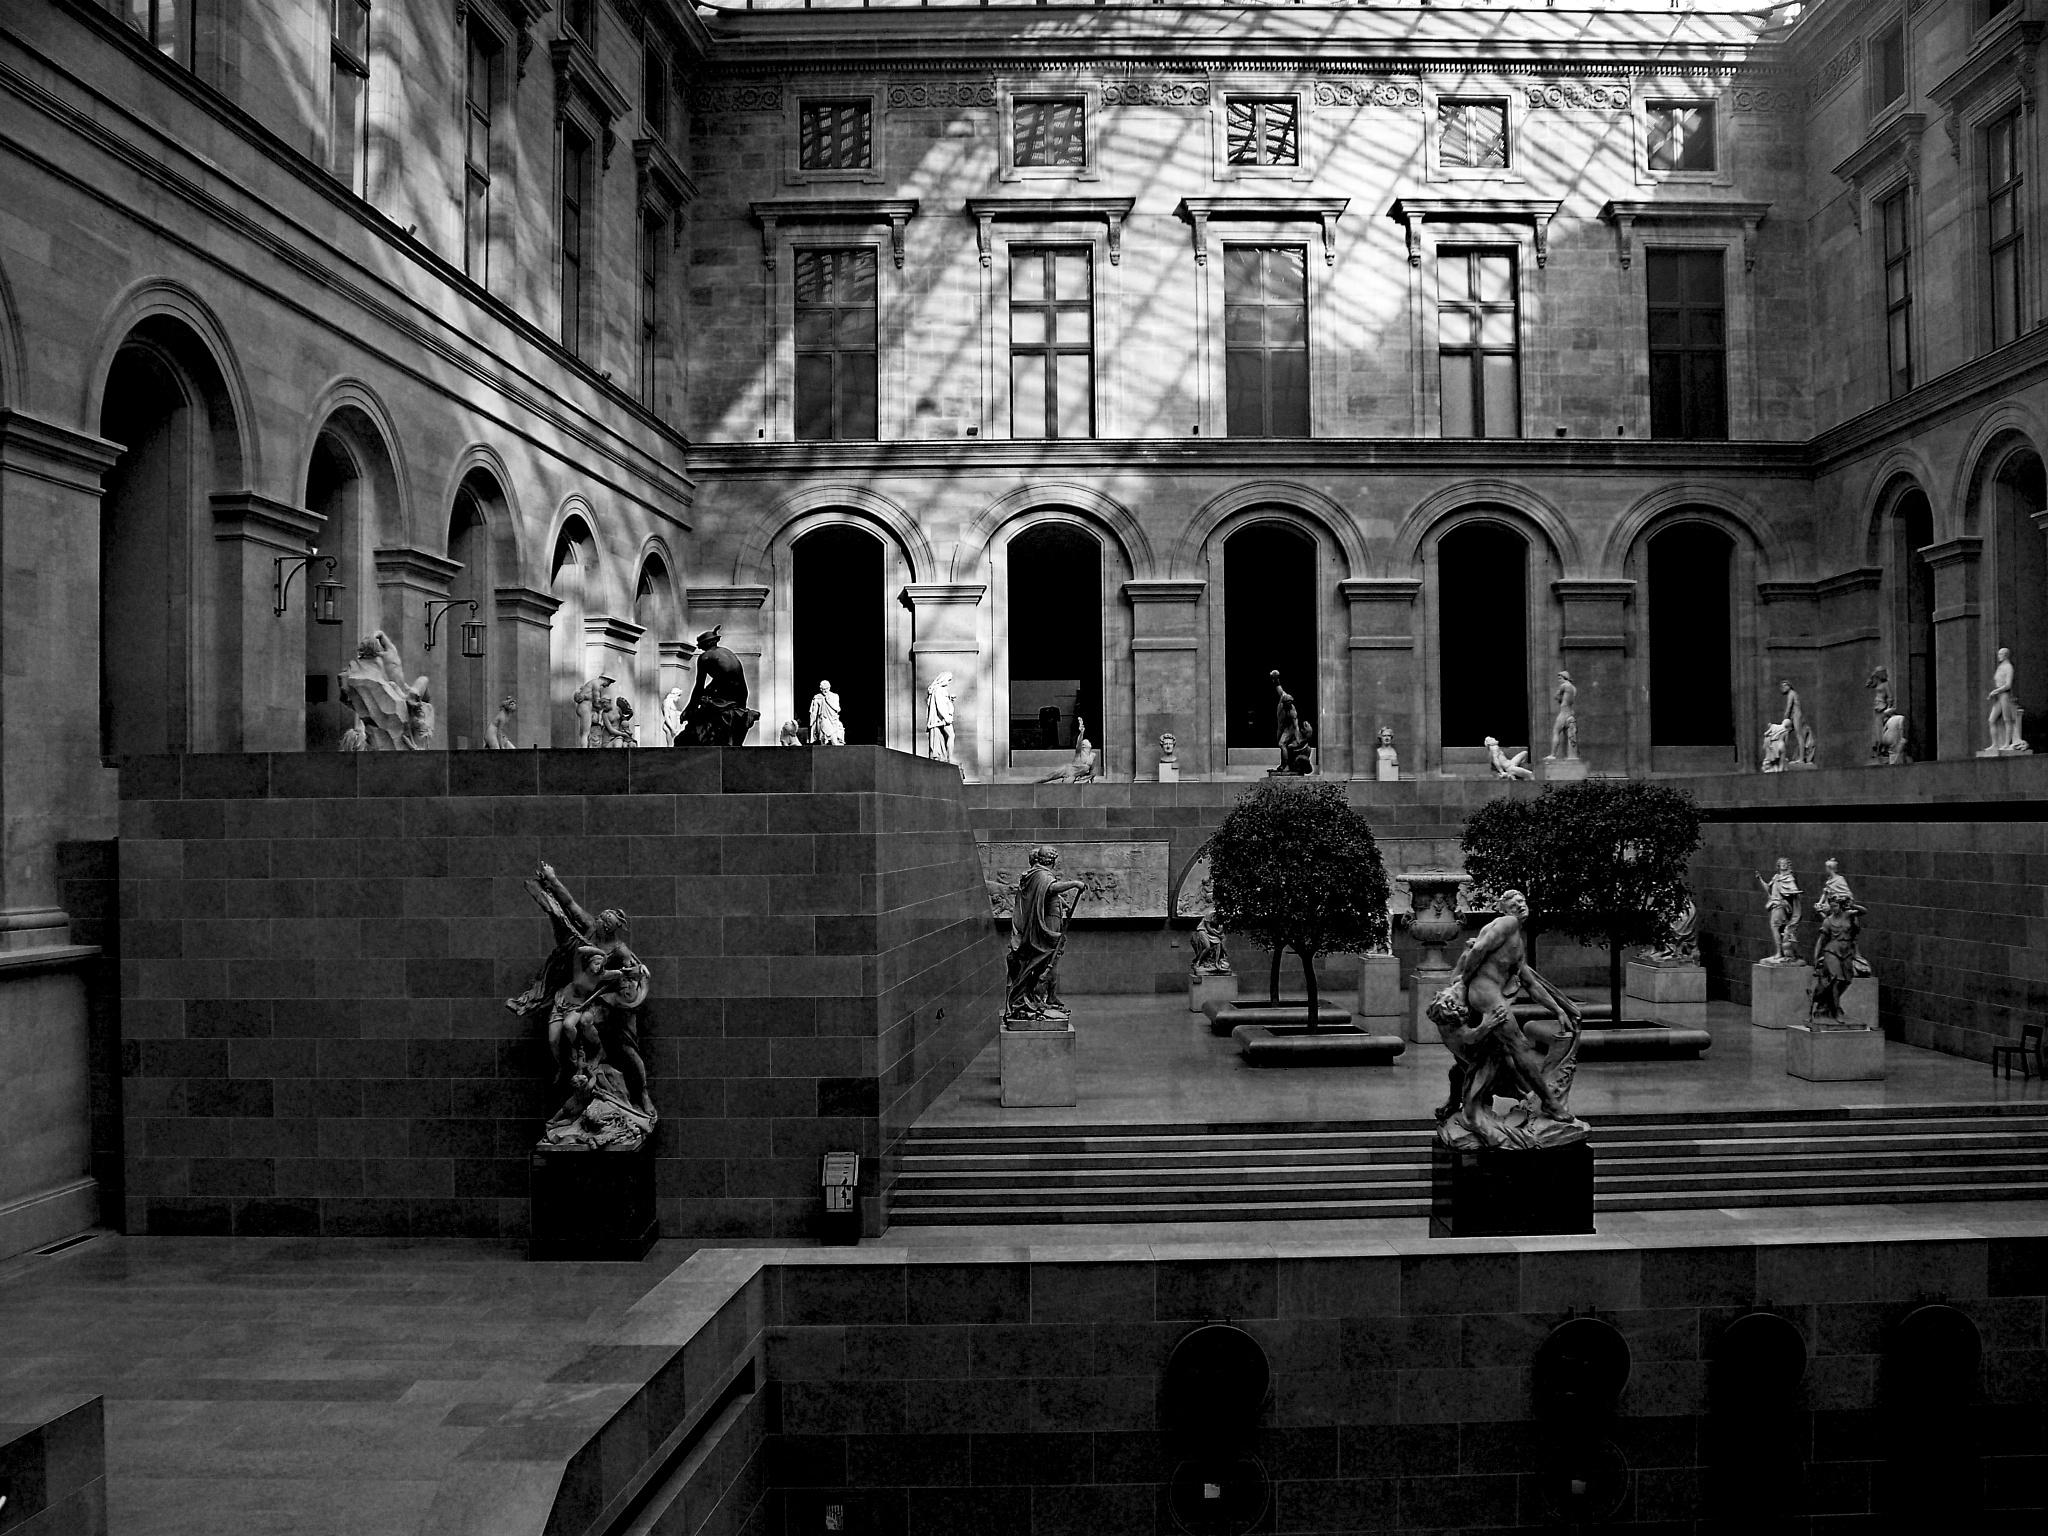 Shadows in Paris by jef